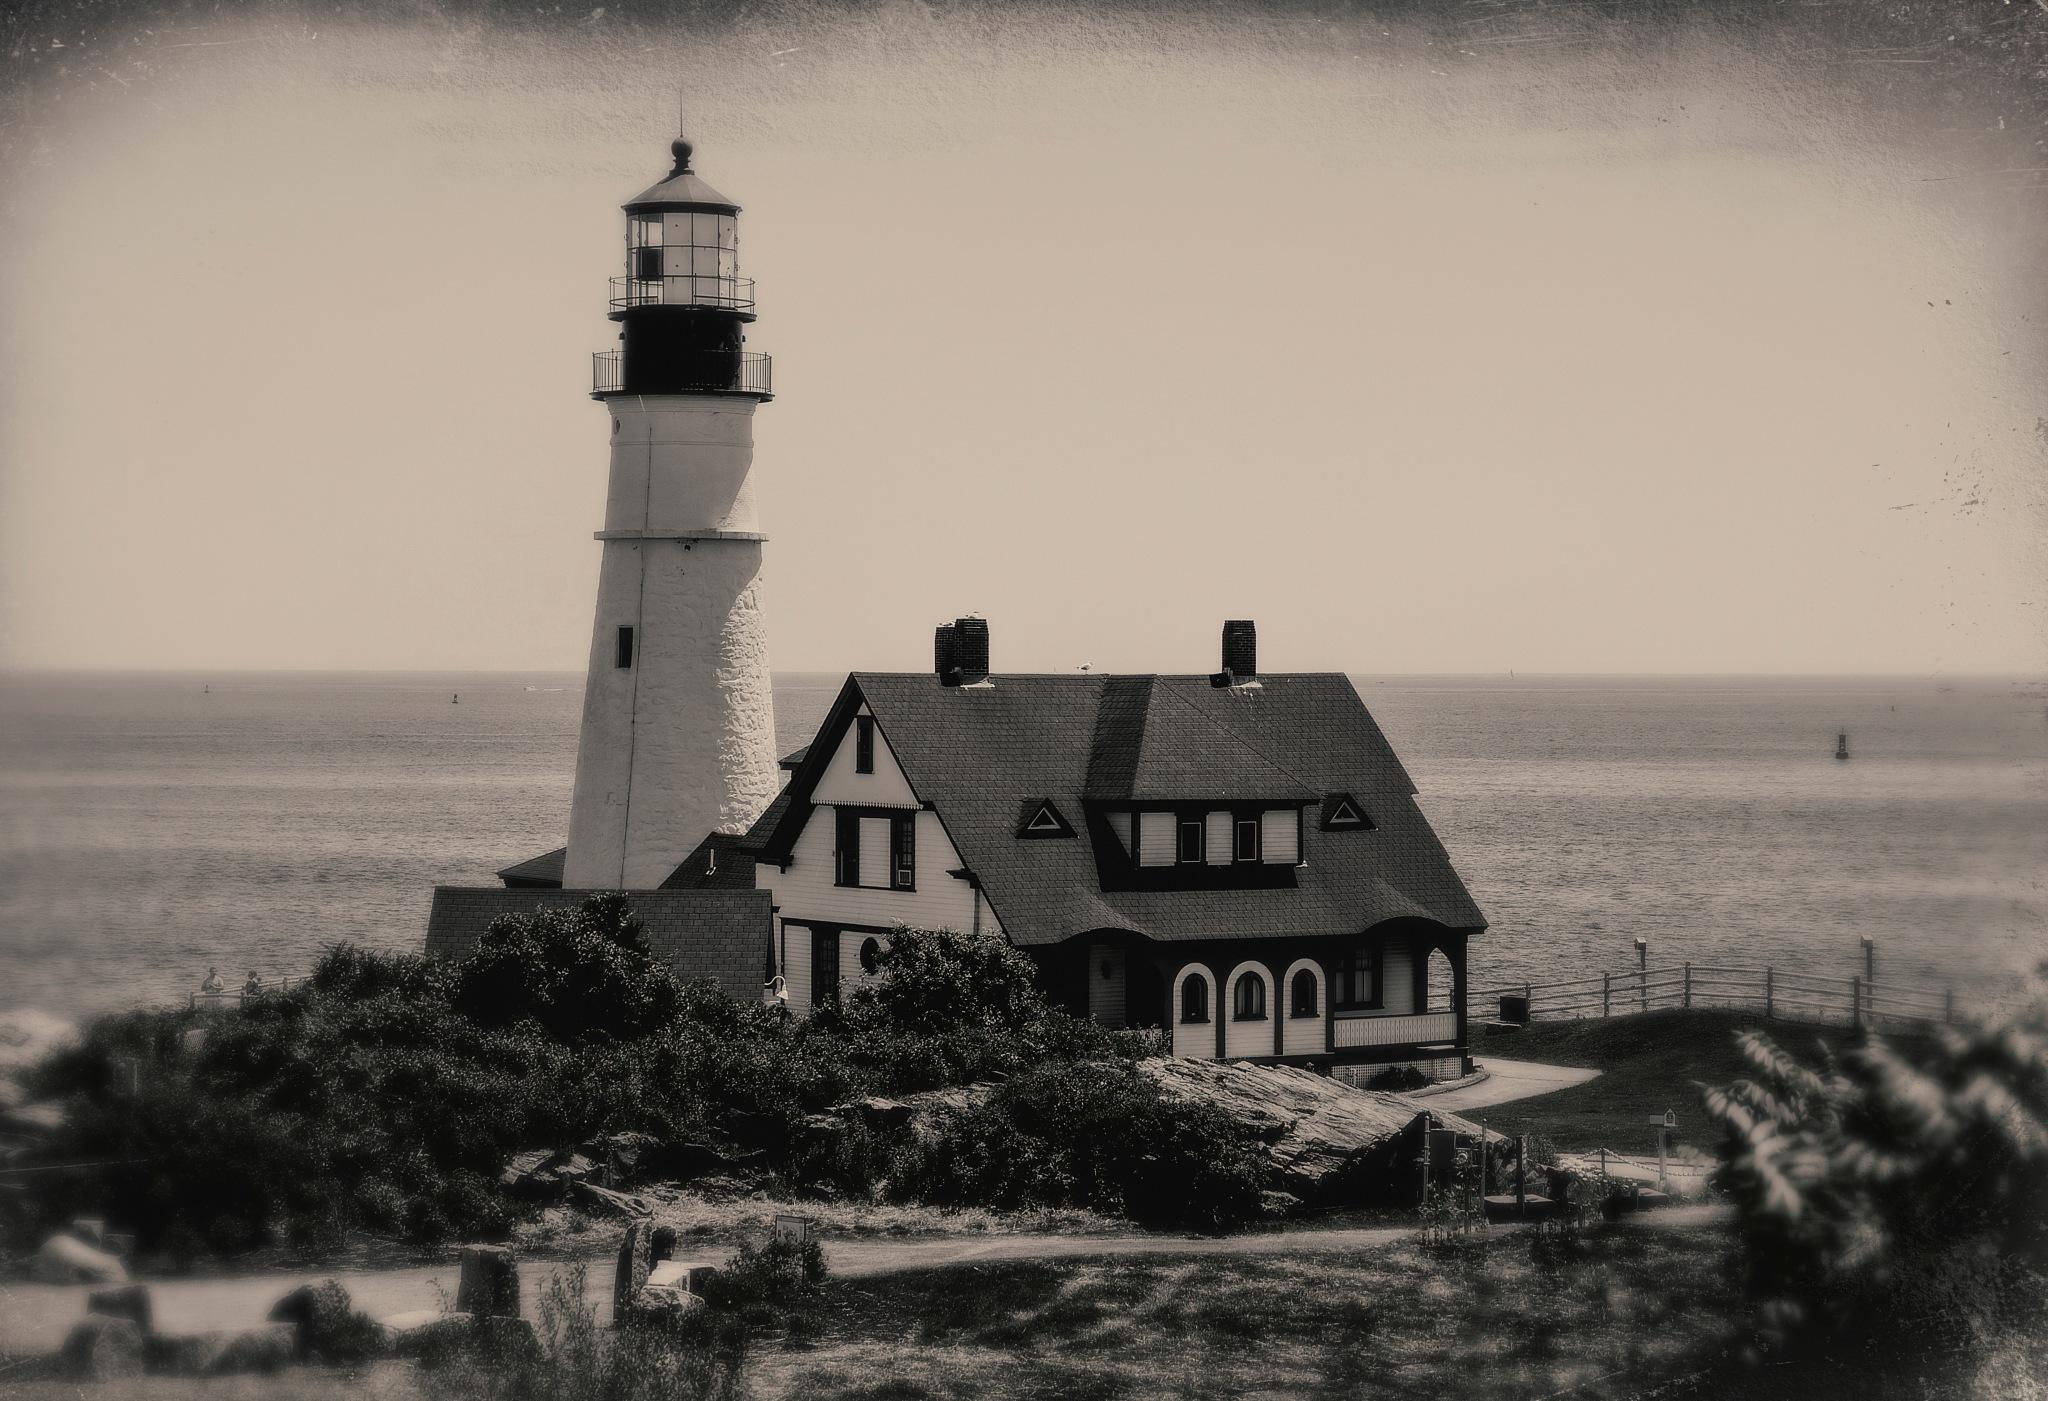 Portland Head Lighthouse by quarryclimber